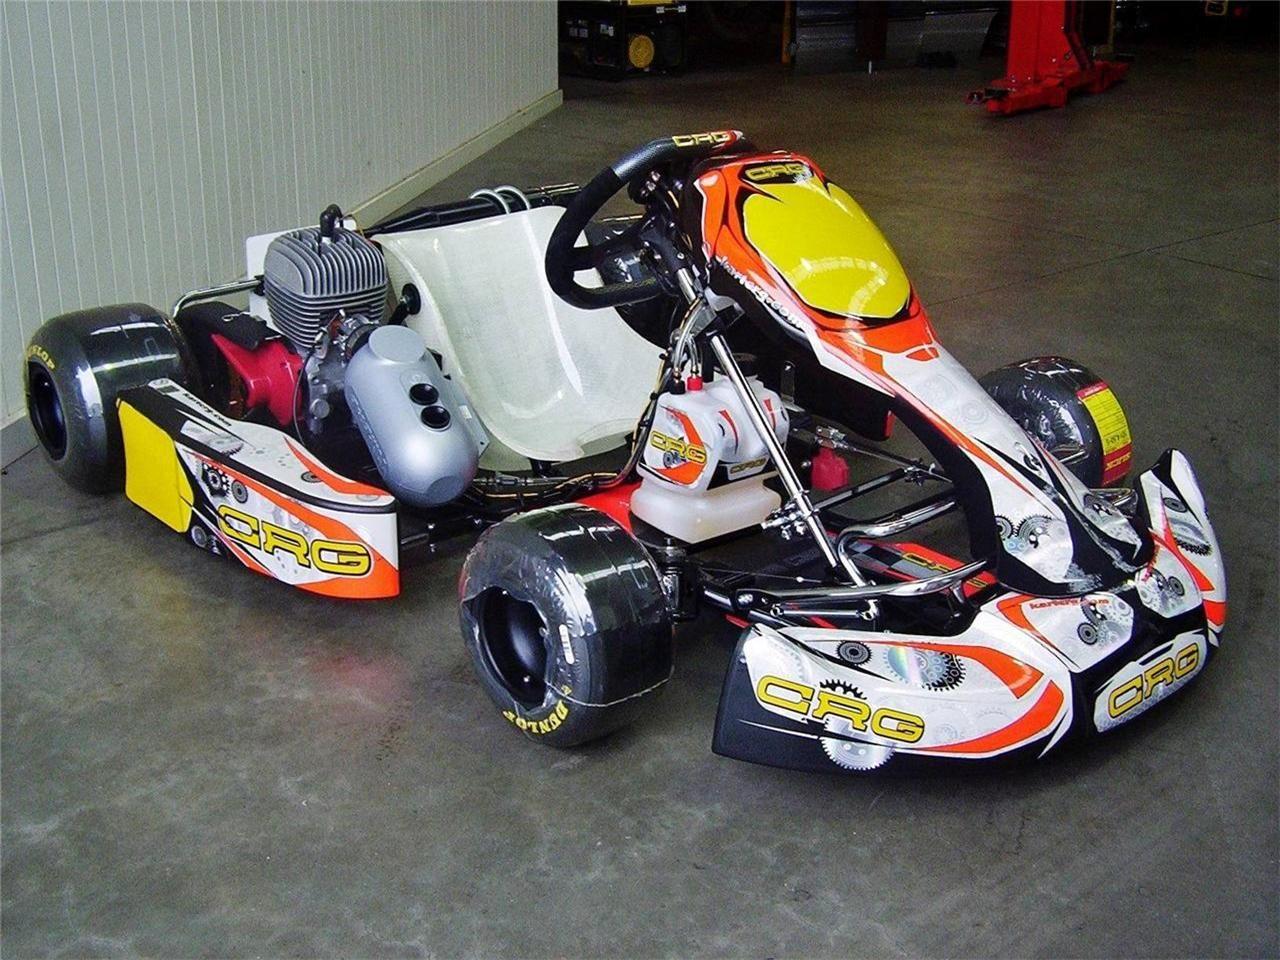 Yamaha Go Kart - Bing Images | Racing Go Karts | Pinterest ...